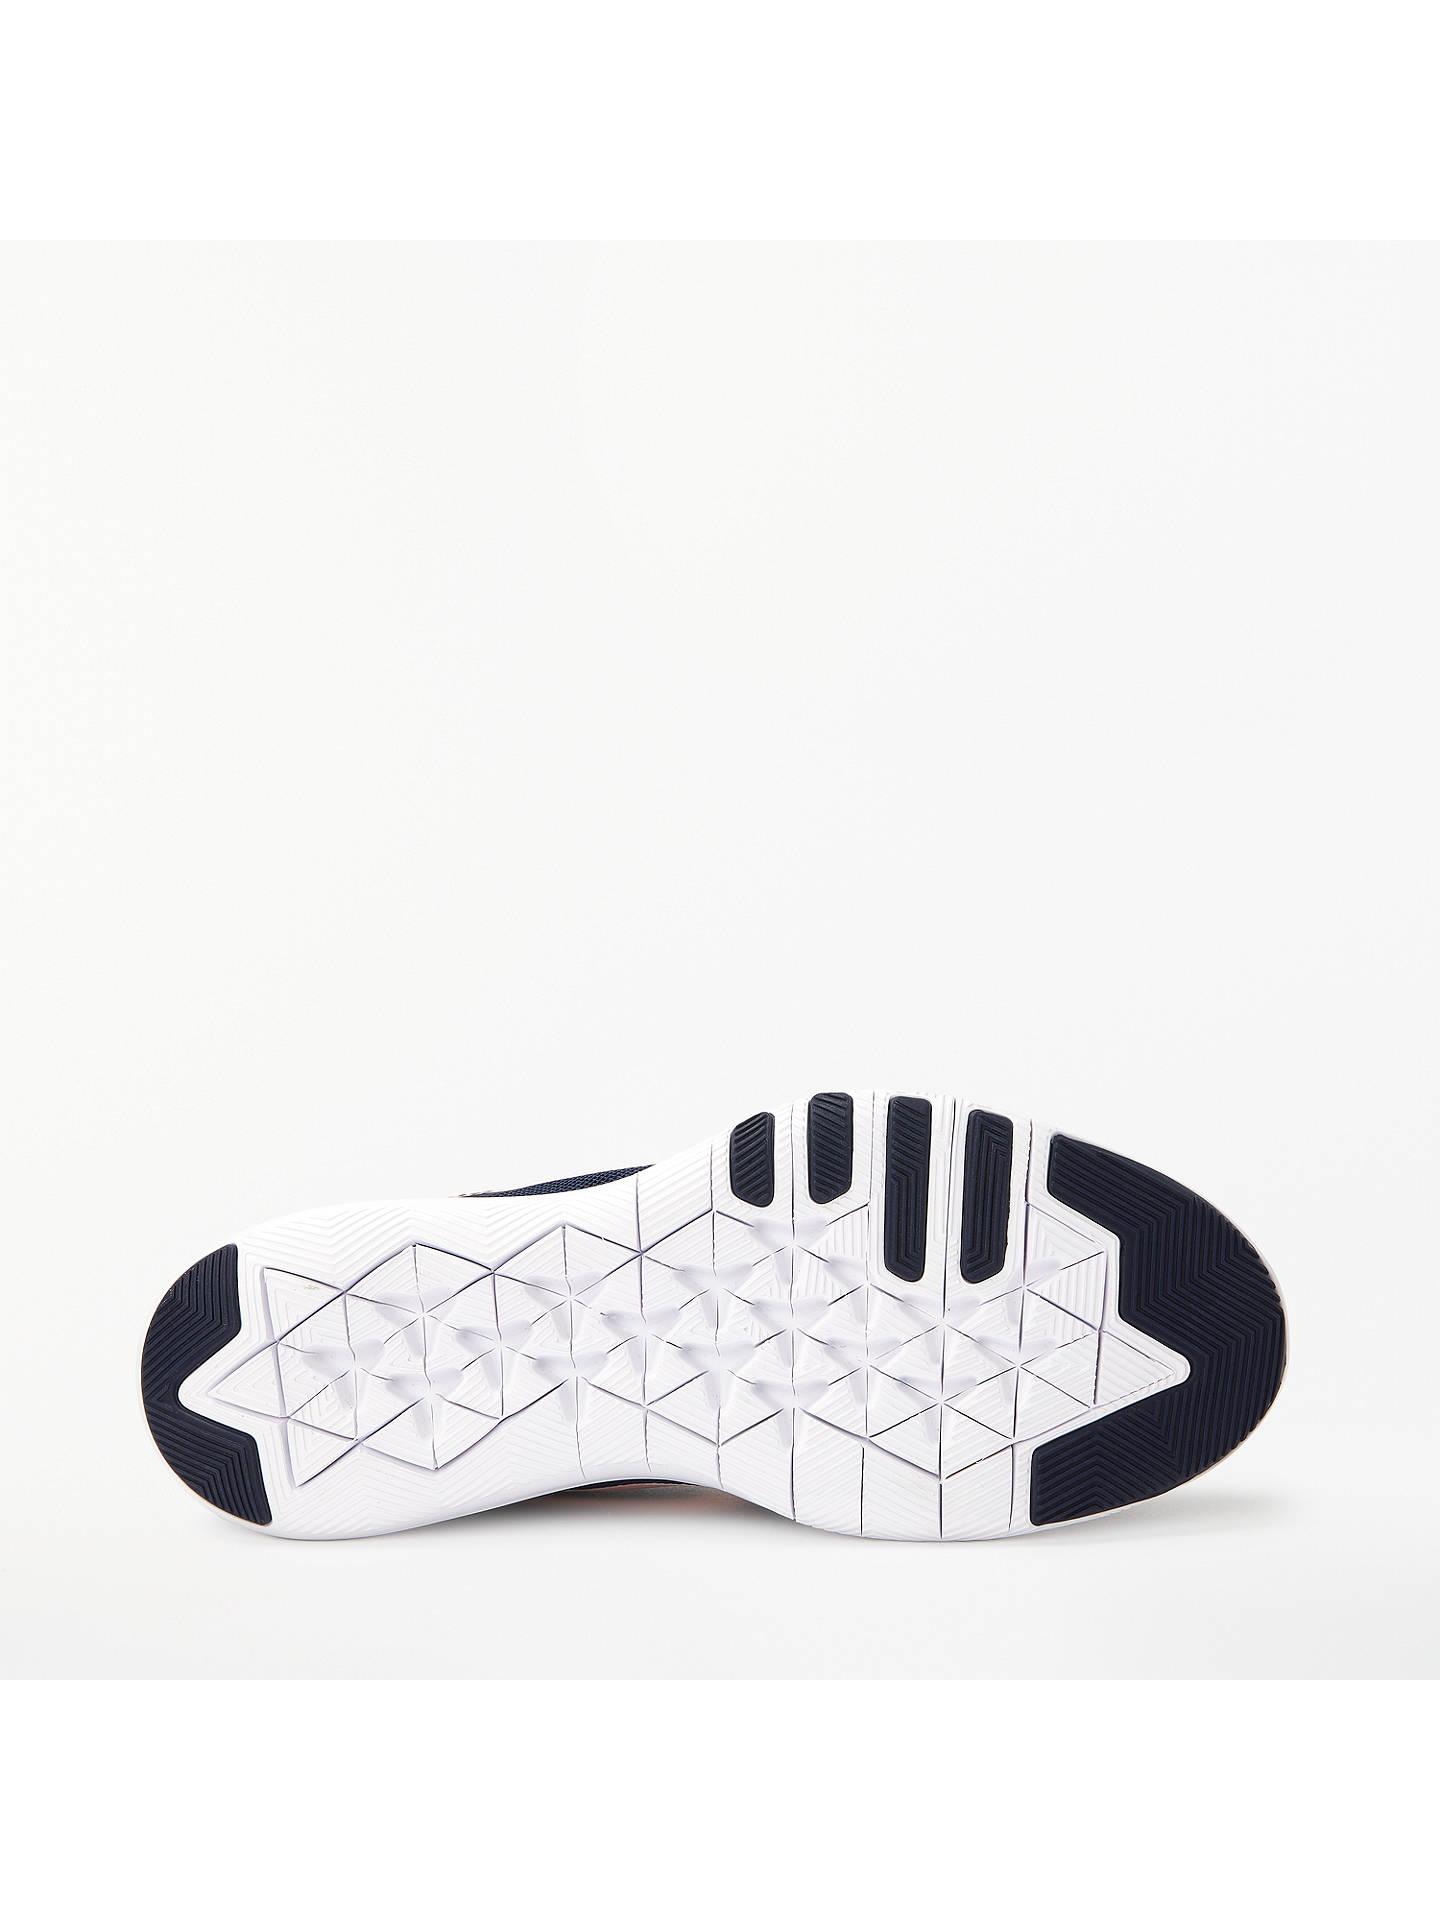 buy online 587cc 7828d ... Buy Nike Flex TR 8 Women s Training Shoes, Obsidian Storm Pink, 4 Online